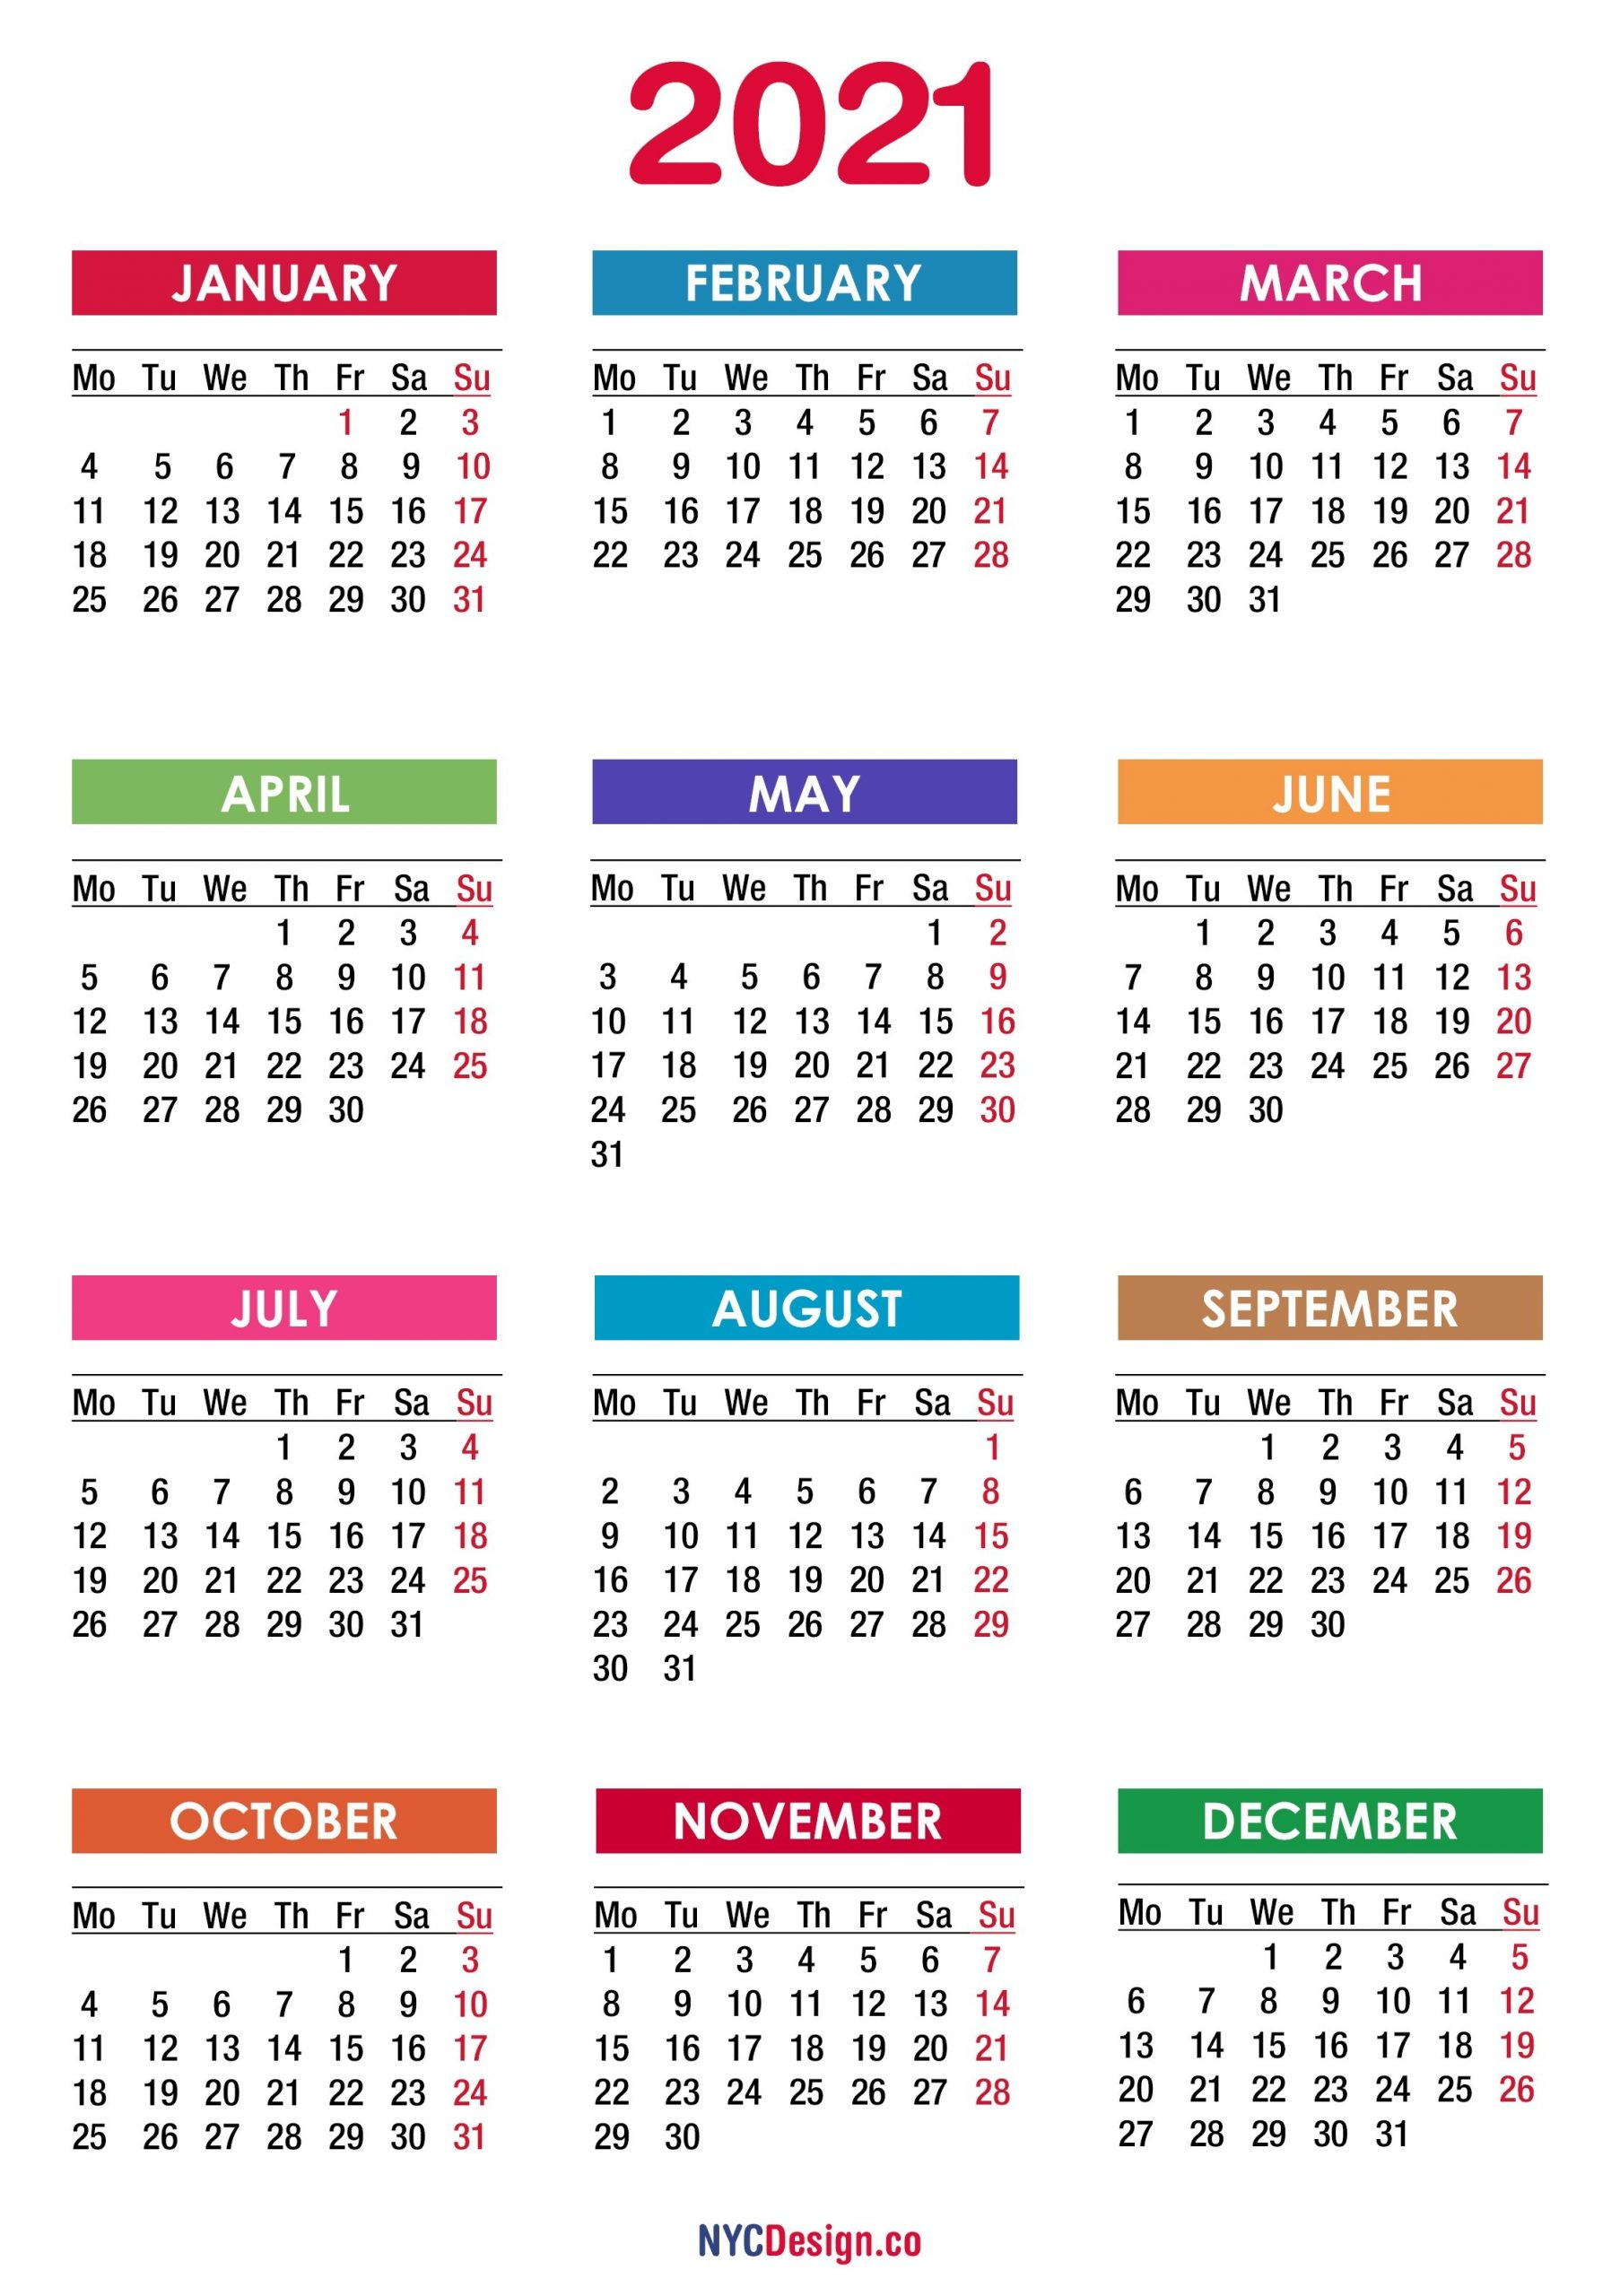 2021 Calendar Printable Free, Pdf, Colorful - Monday Start - Nycdesign.co | Calendars Printable Free with regard to Free Printable Calendar 2021